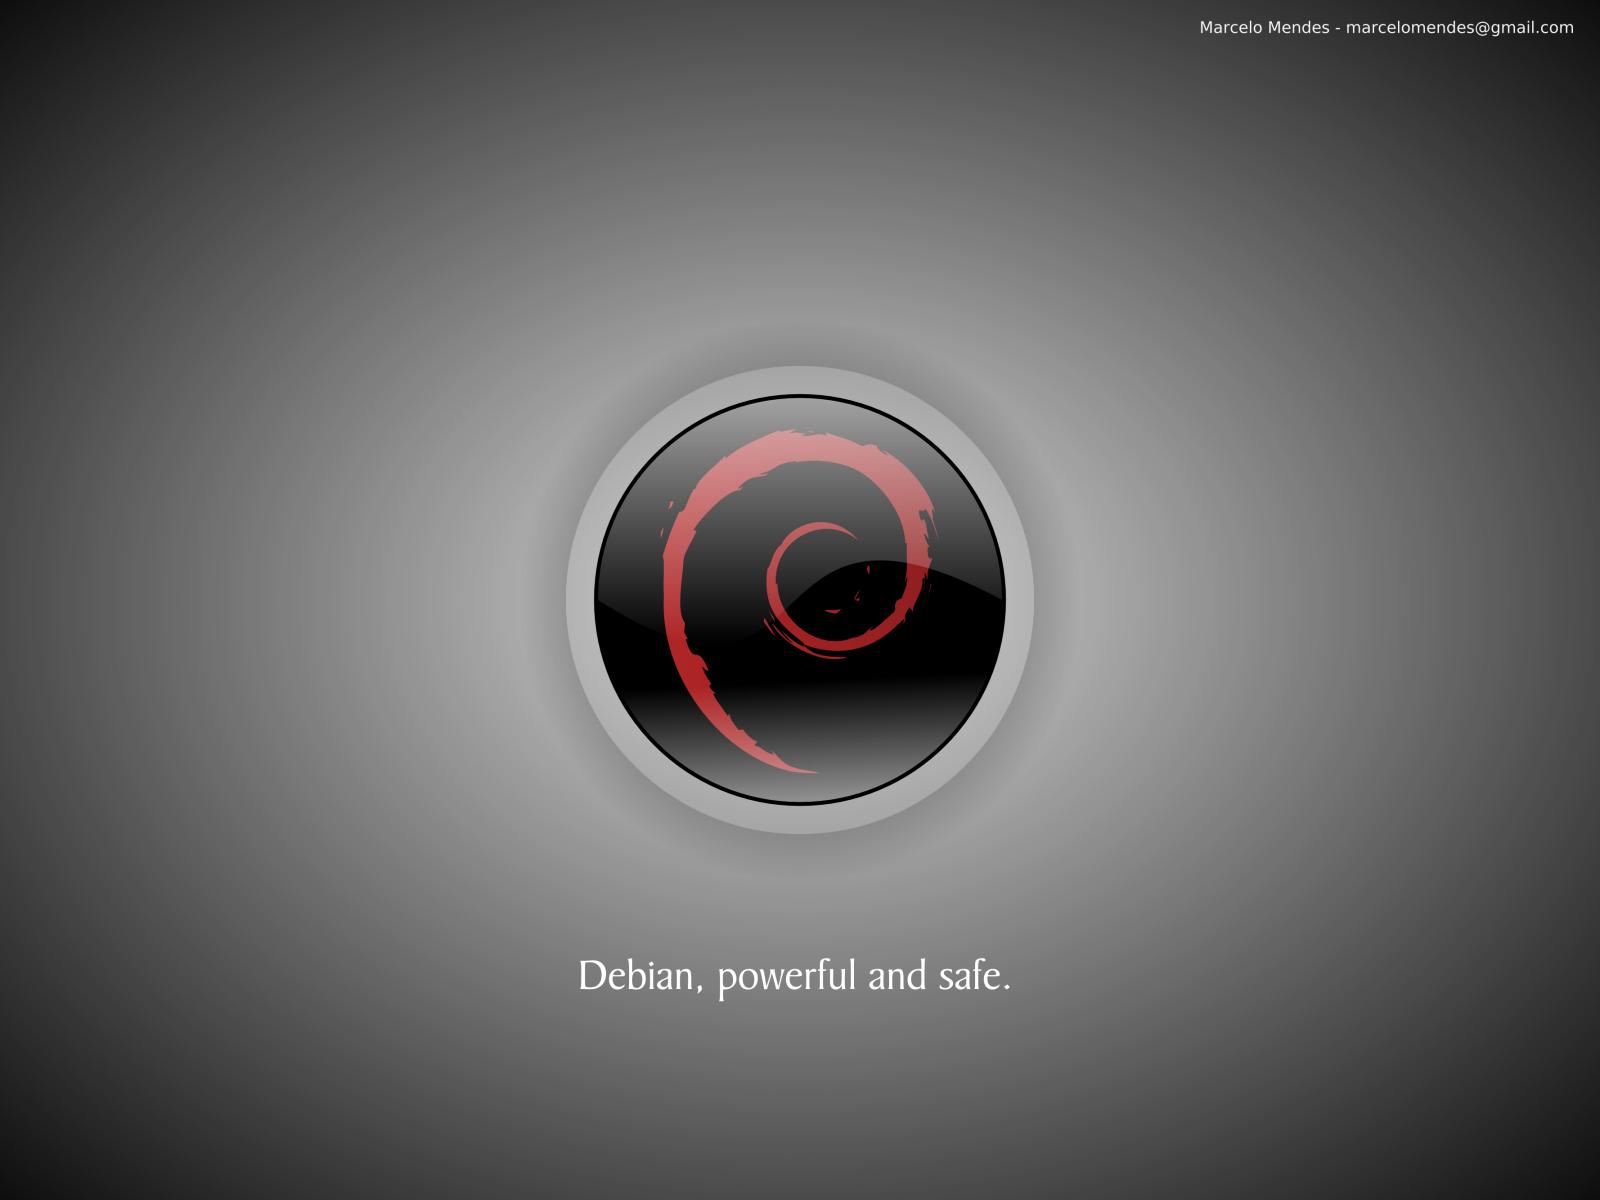 debian-wallpaper-safe.jpg